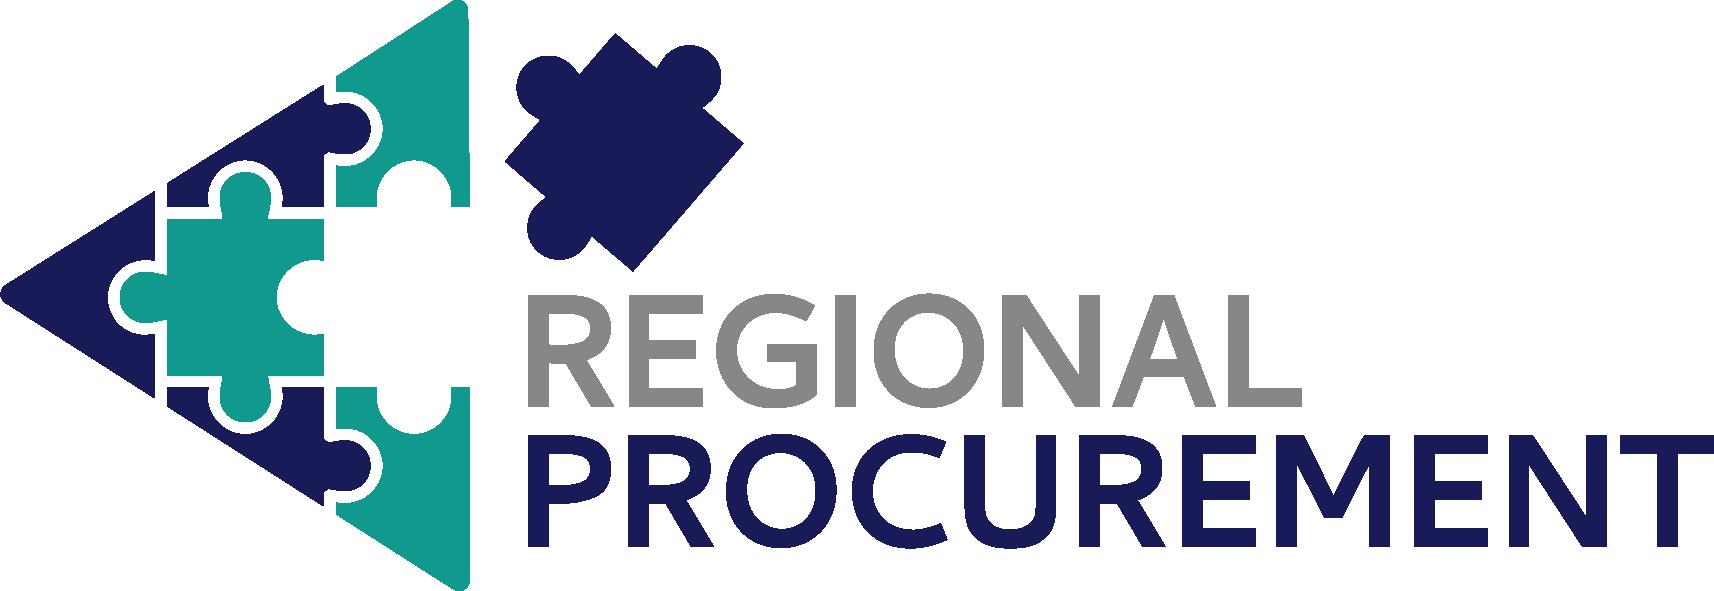 Regional Procurement